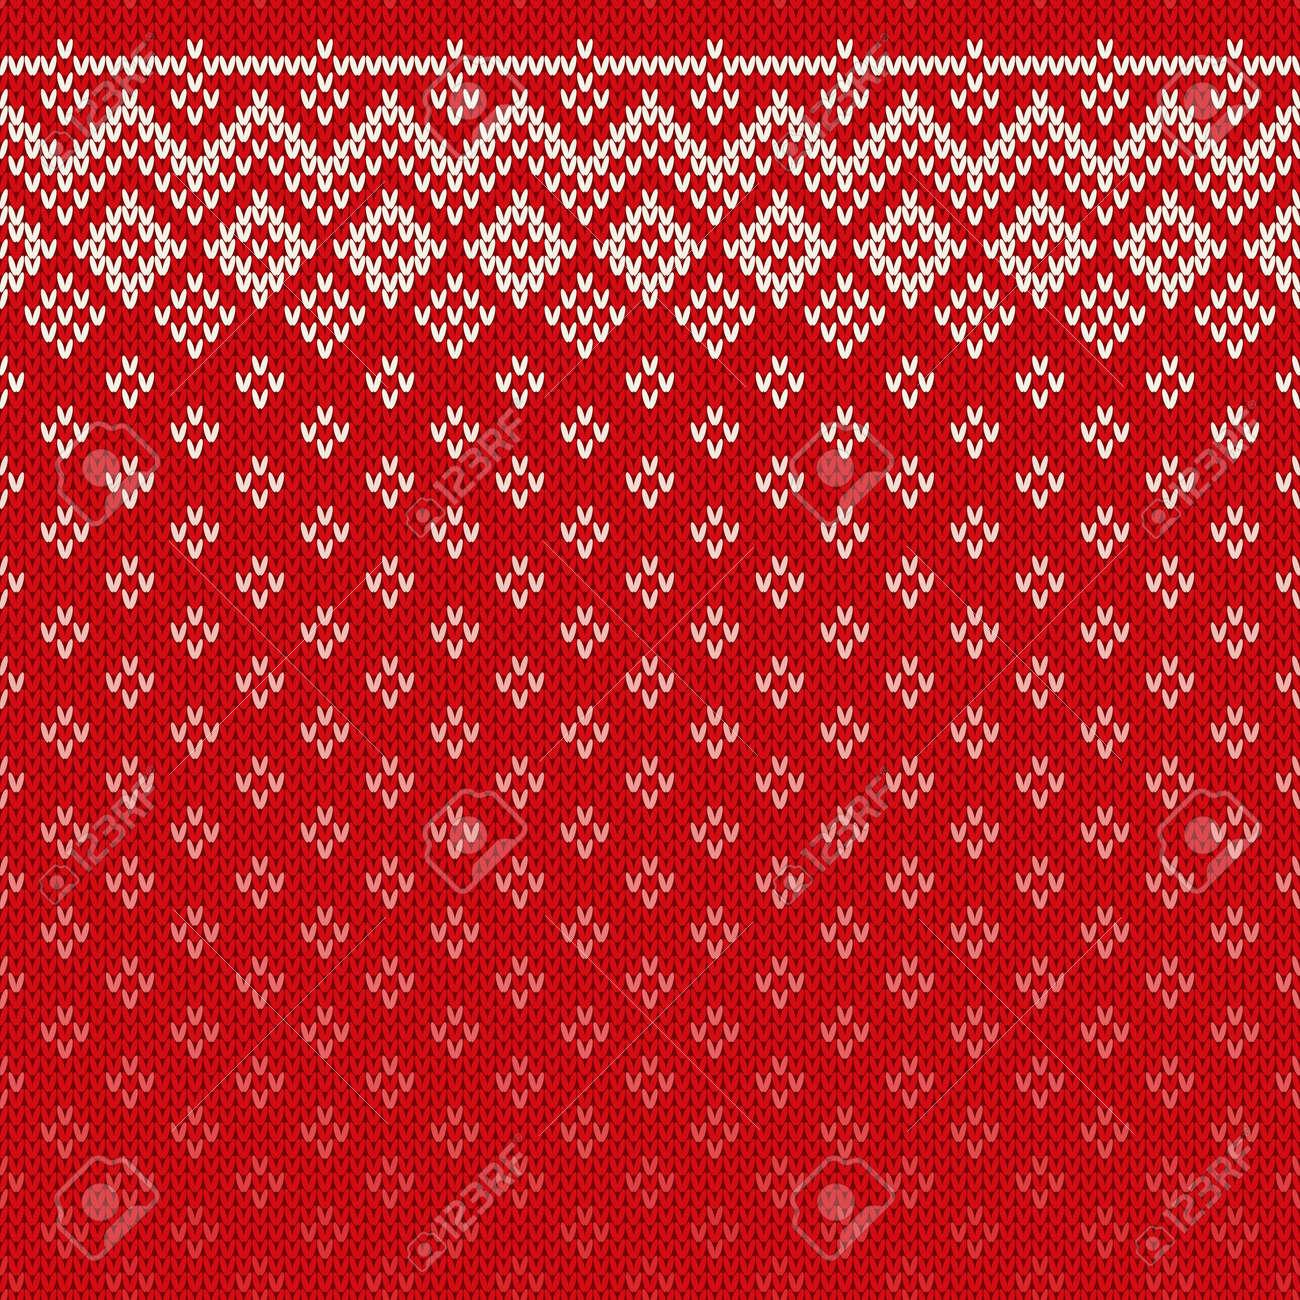 e5e6153e4223 Christmas Sweater Design. Seamless Knitting Pattern Royalty Free ...